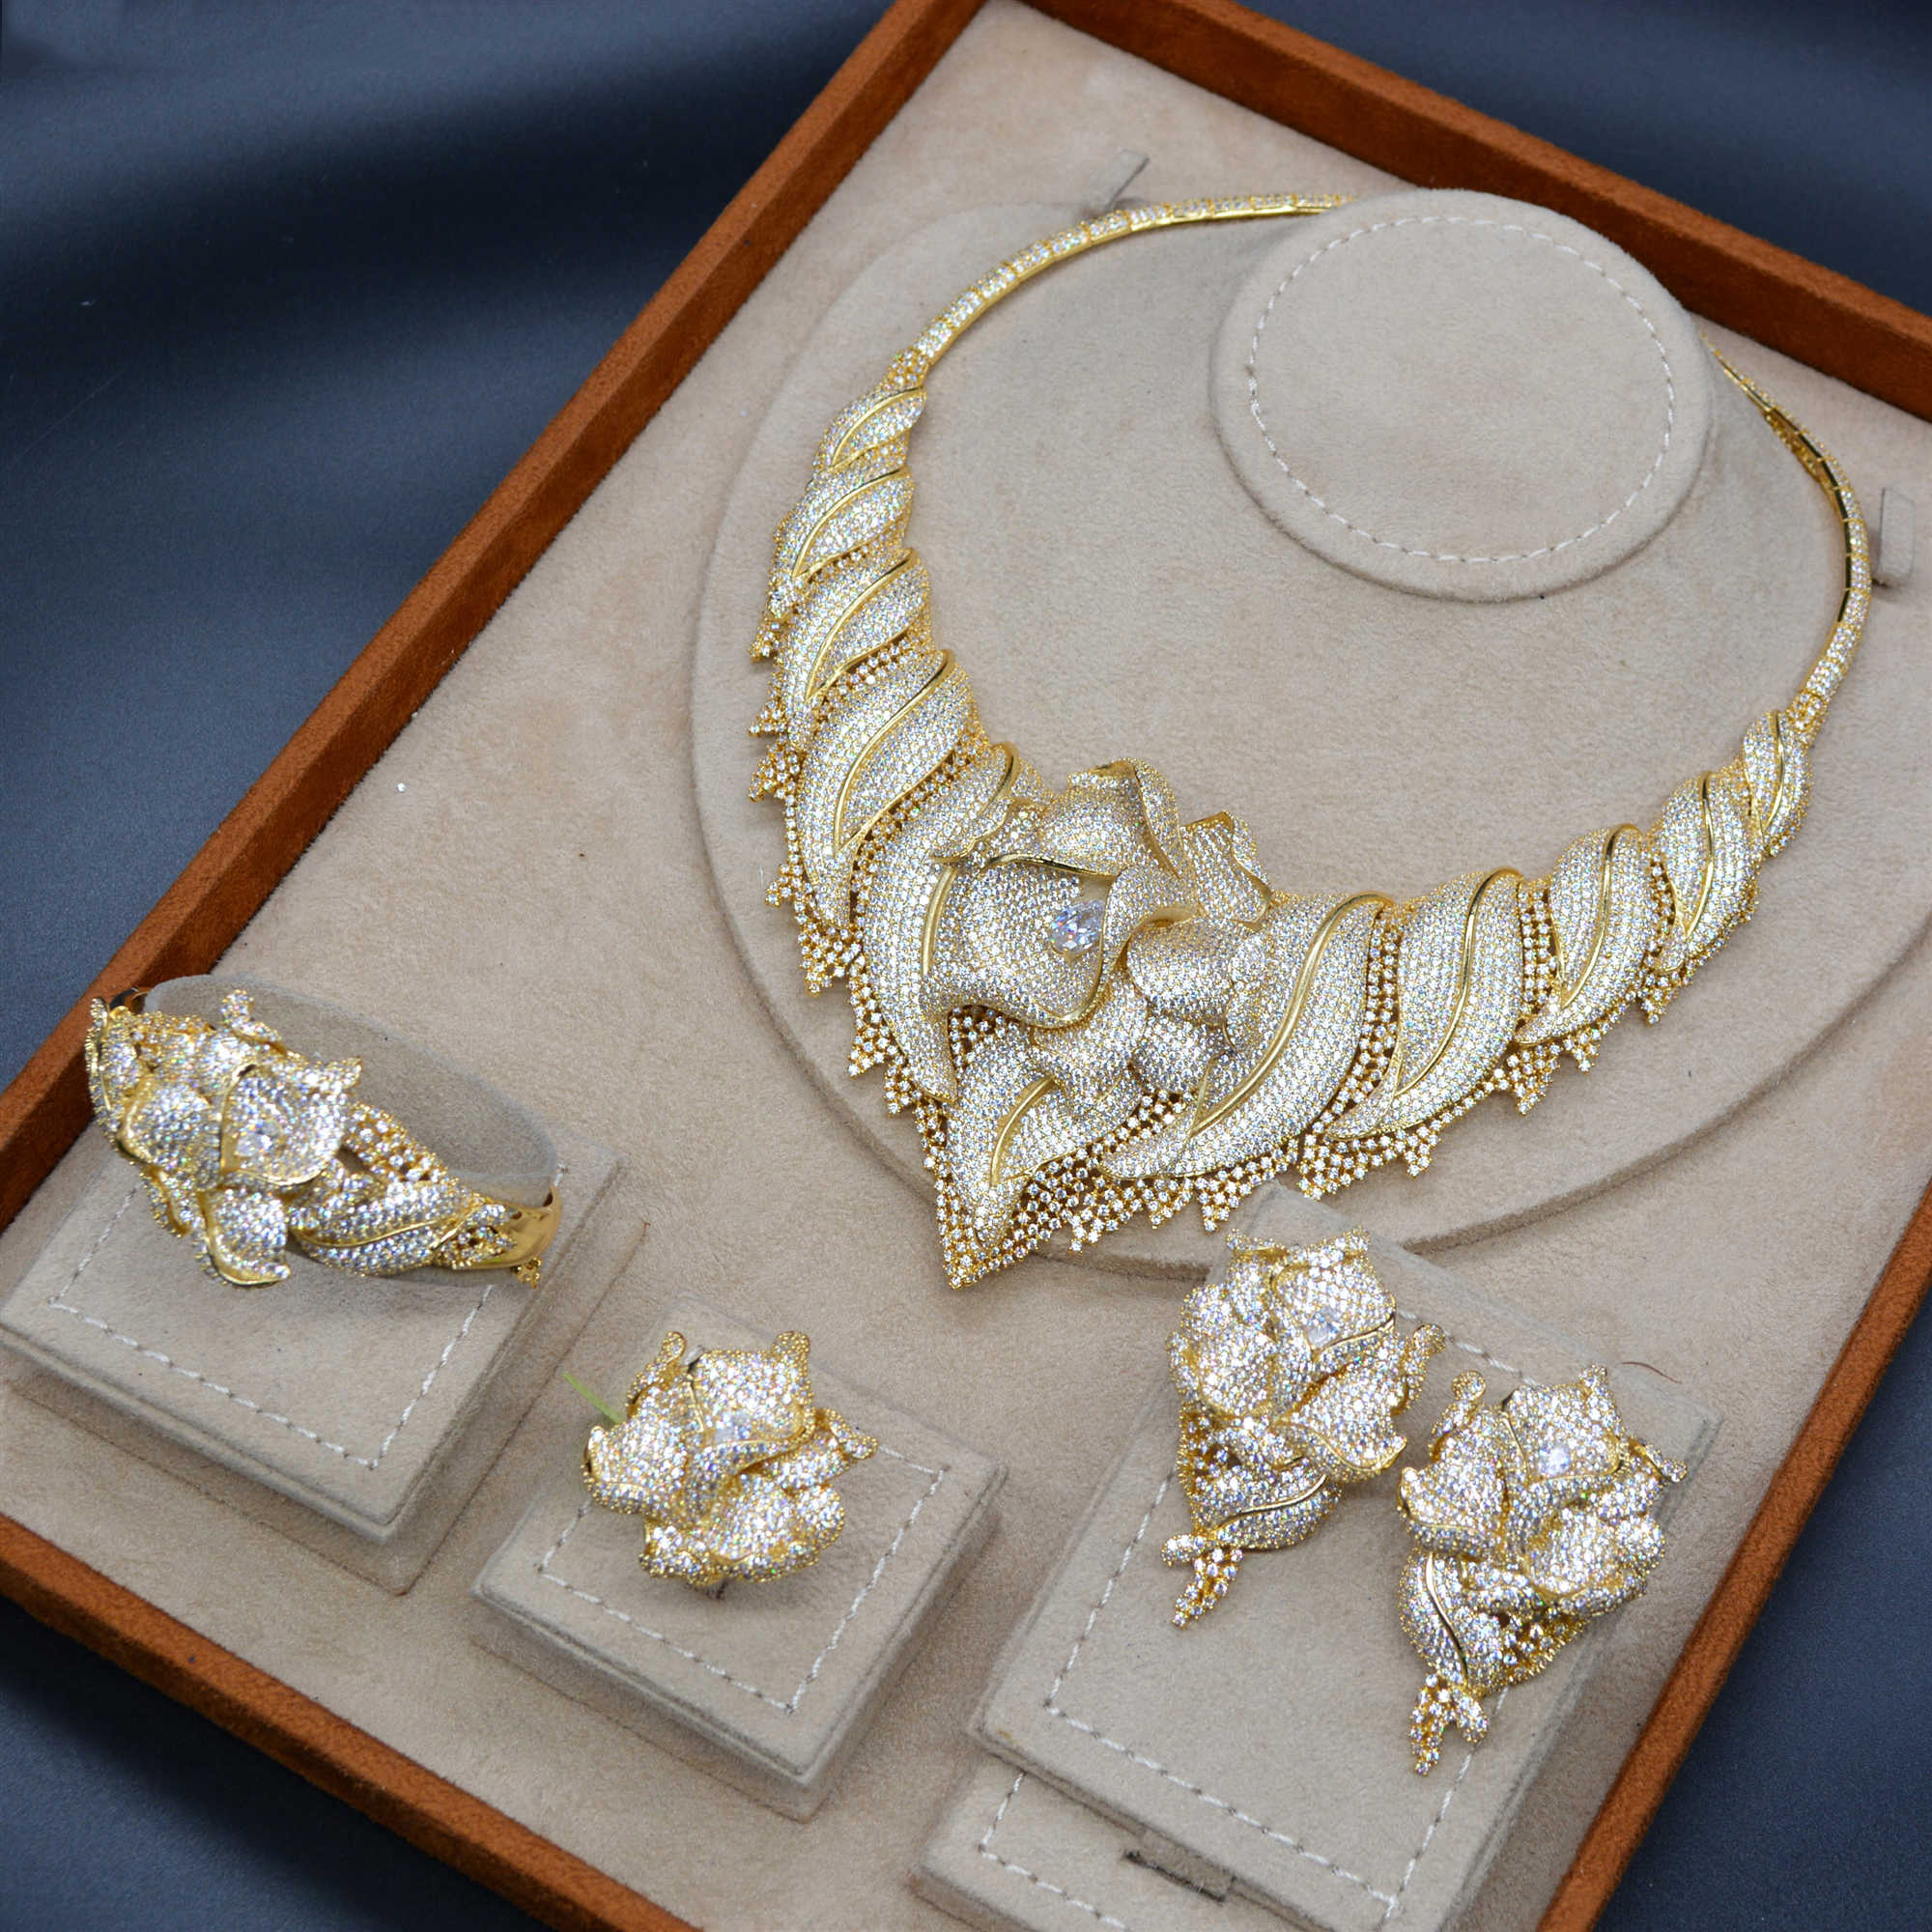 Image 5 - GODKI Trendy Luxury 4PCS Flower Nigeria Statement Jewelry Sets For Women Wedding Full Cubic Zircon Dubai Bridal jewelry Set 2019-in Jewelry Sets from Jewelry & Accessories